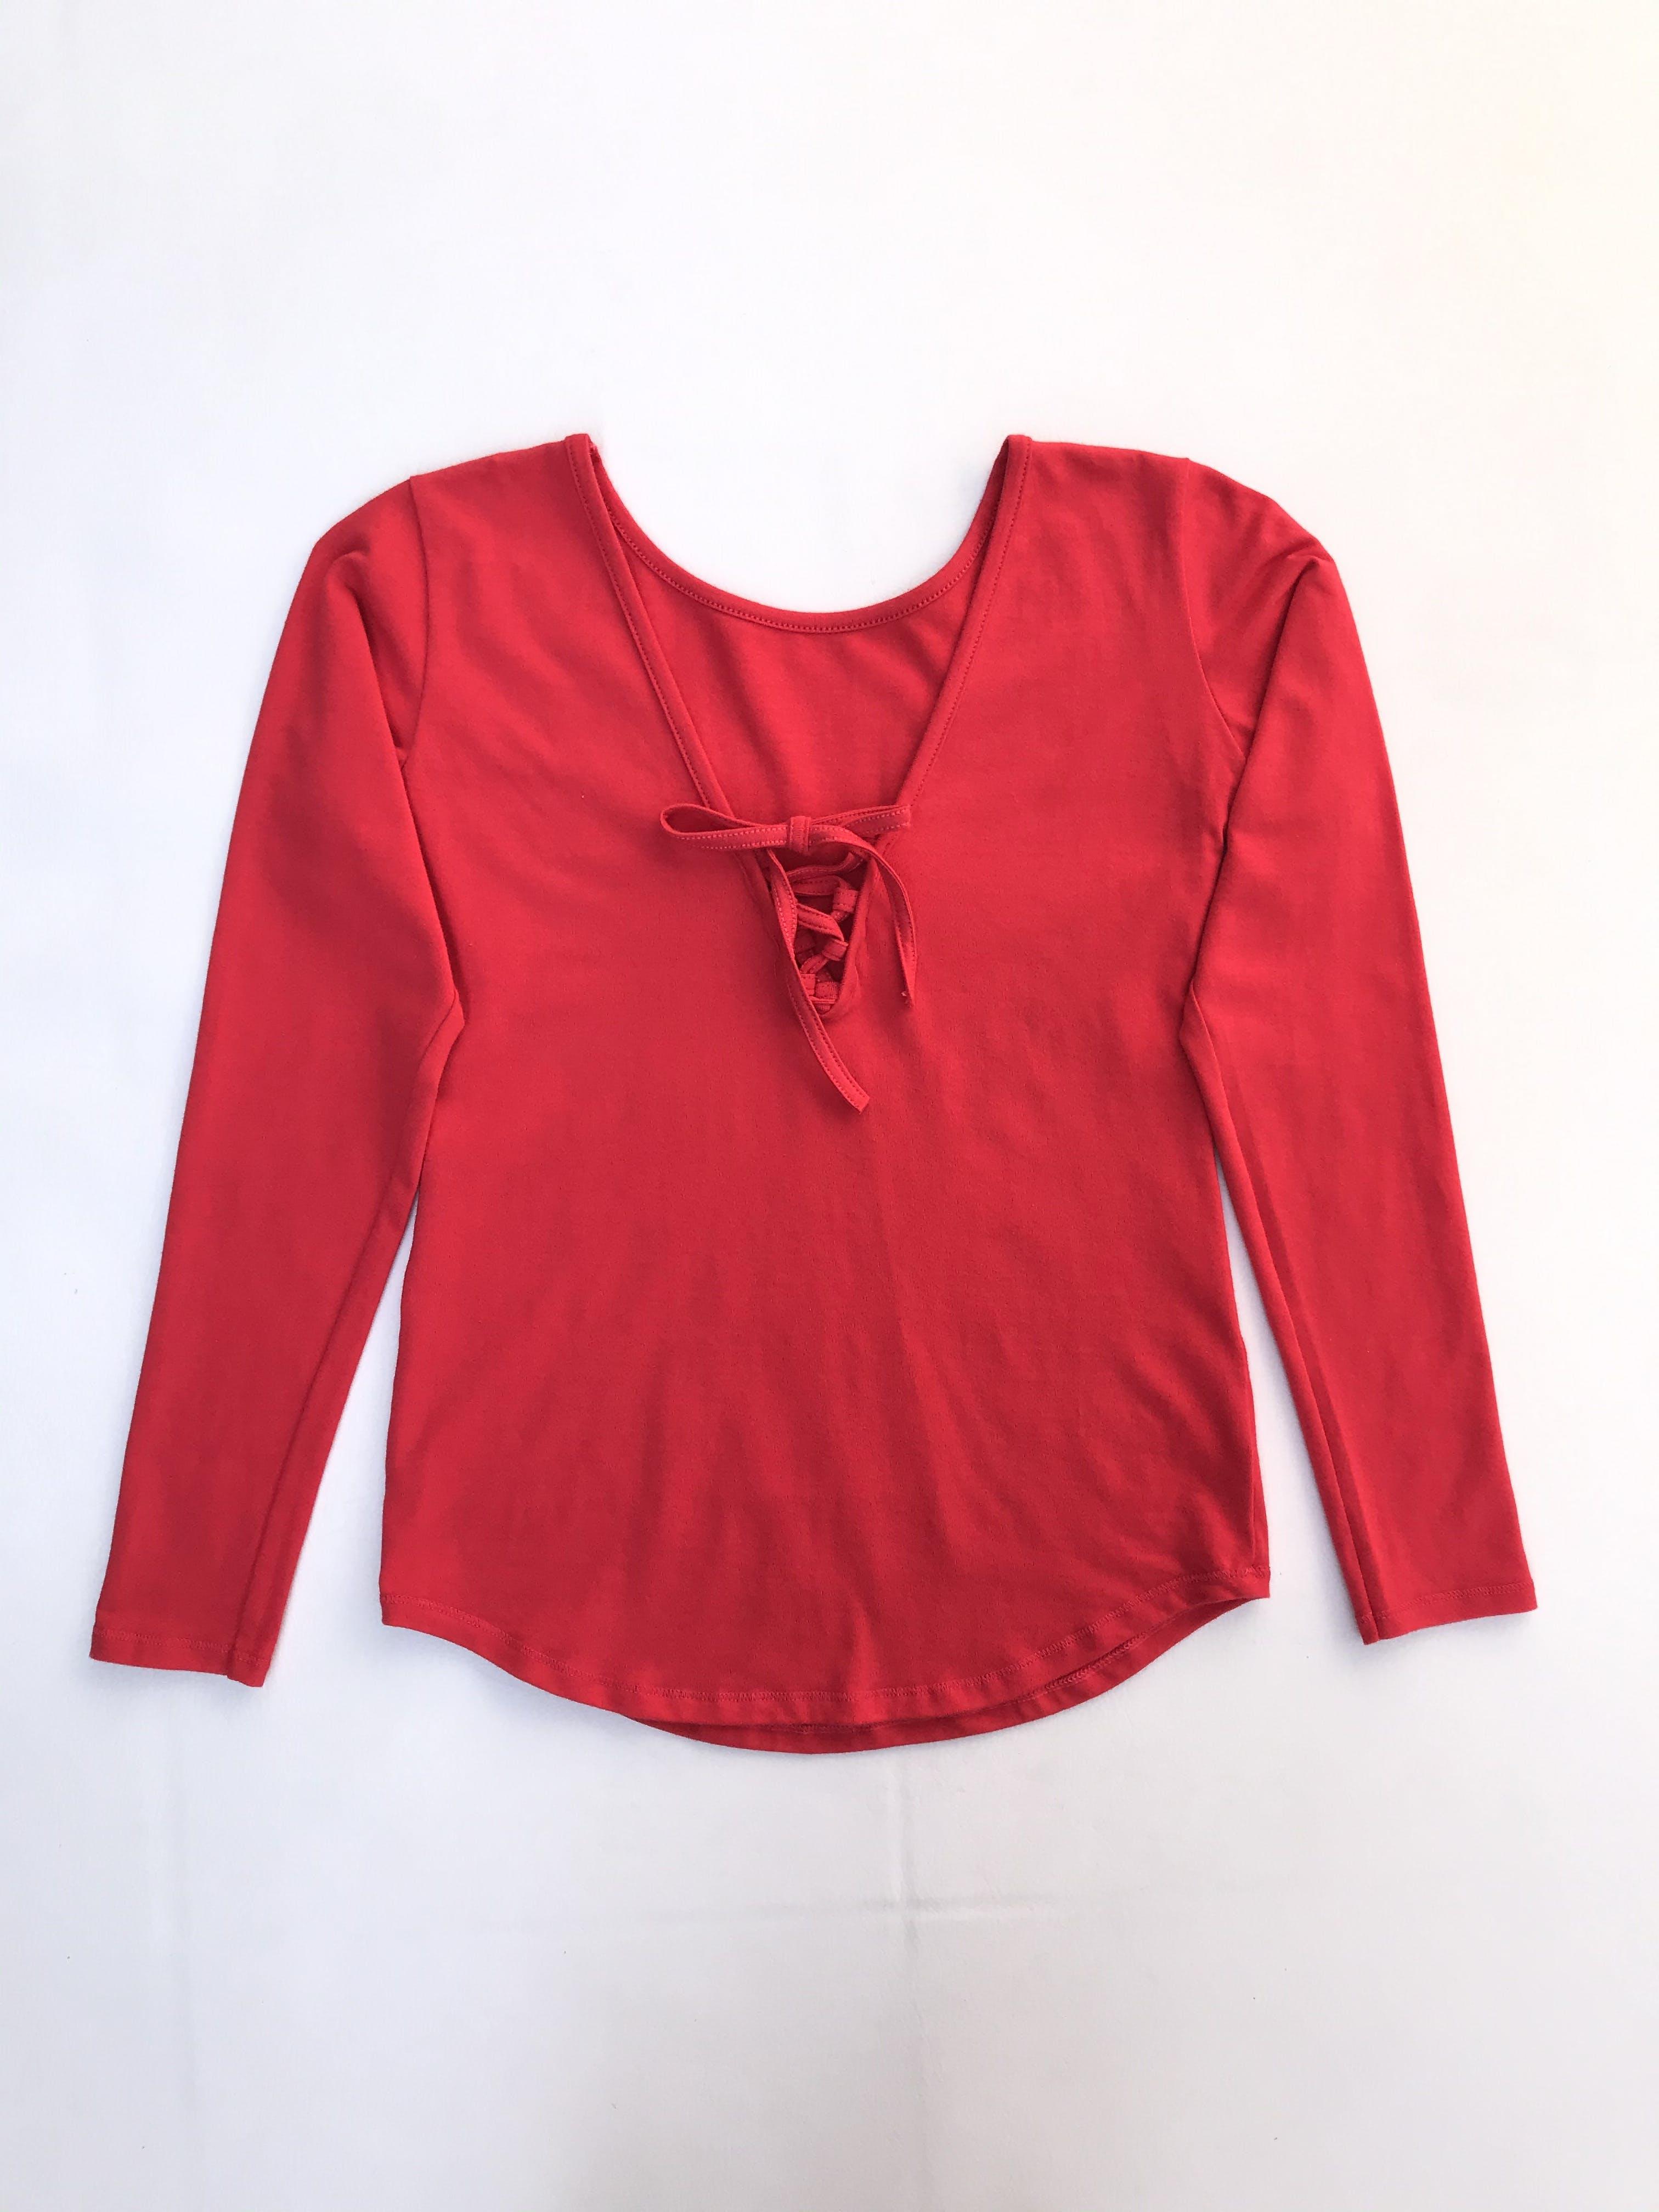 Polo rojo manga larga tirita en el escote, tela tipo algodón stretch